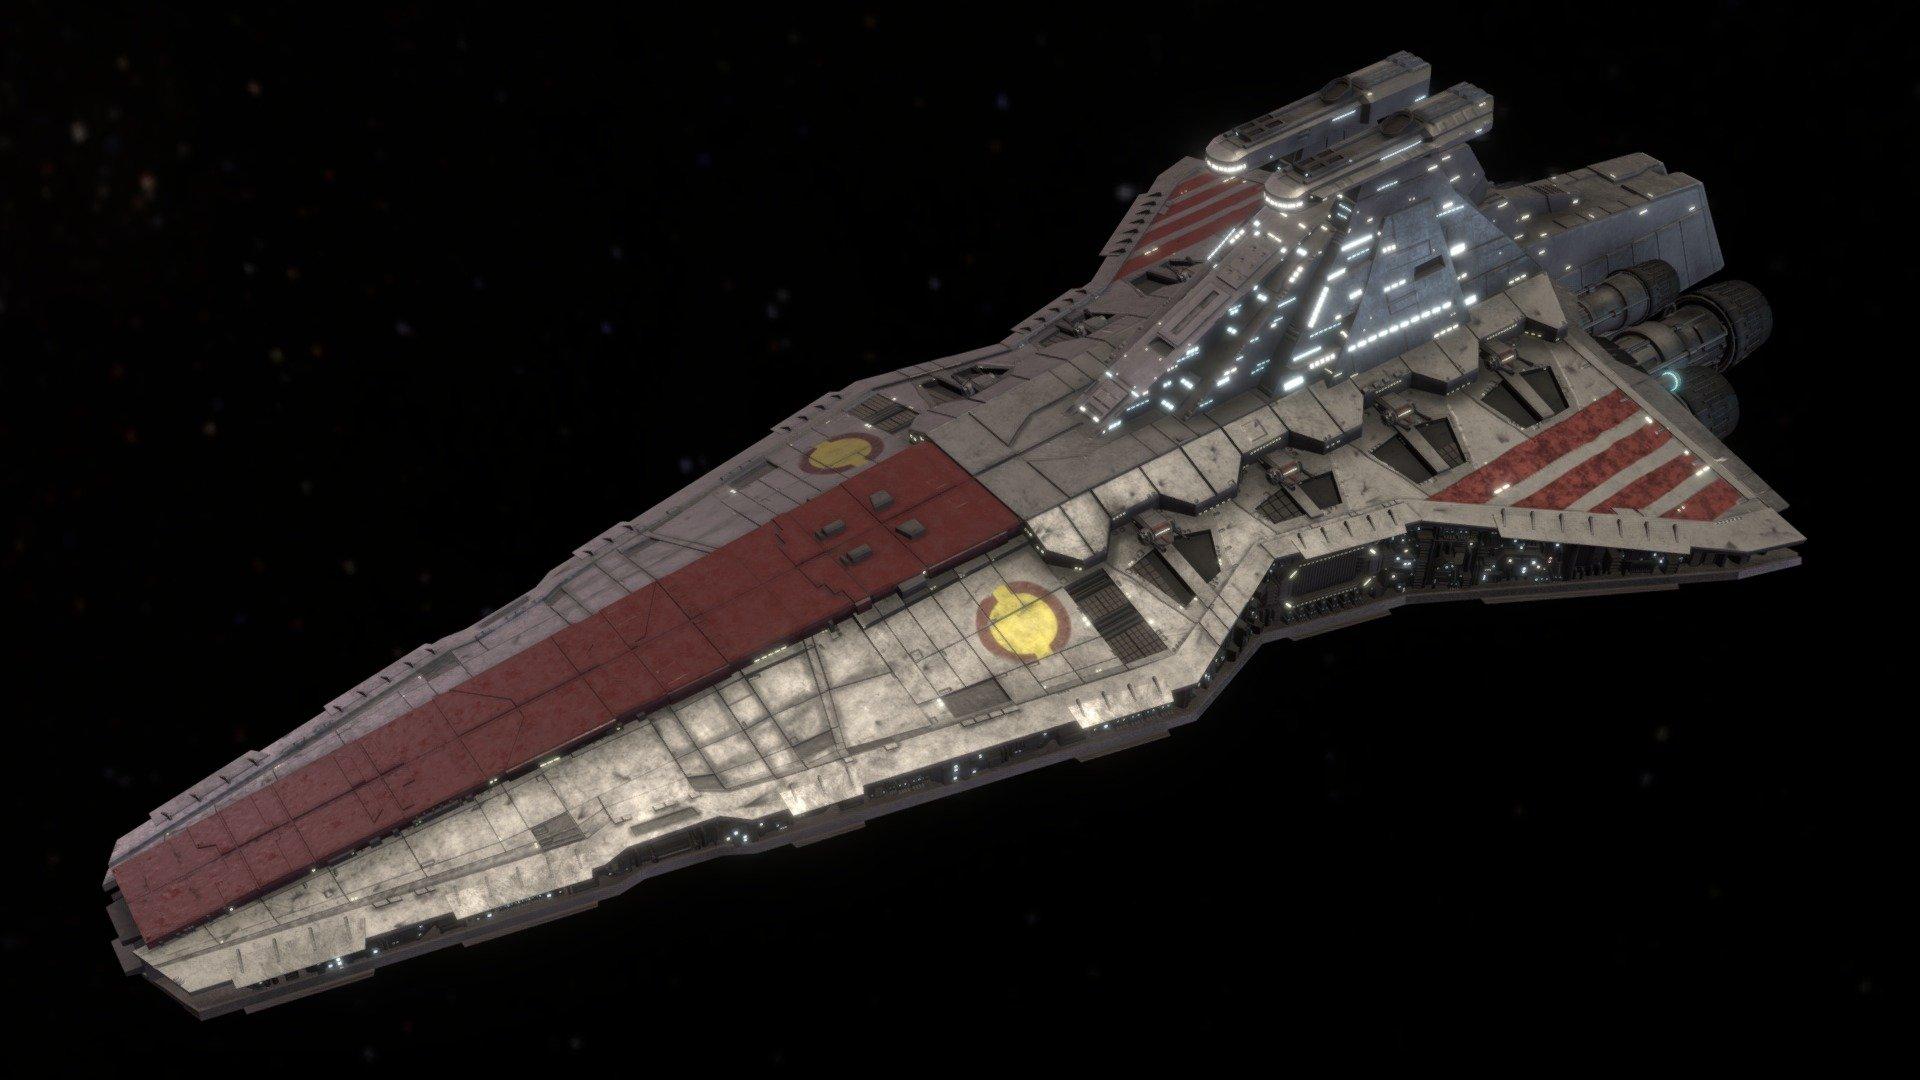 Venator Class Republic Star Destroyer Buy Royalty Free 3d Model